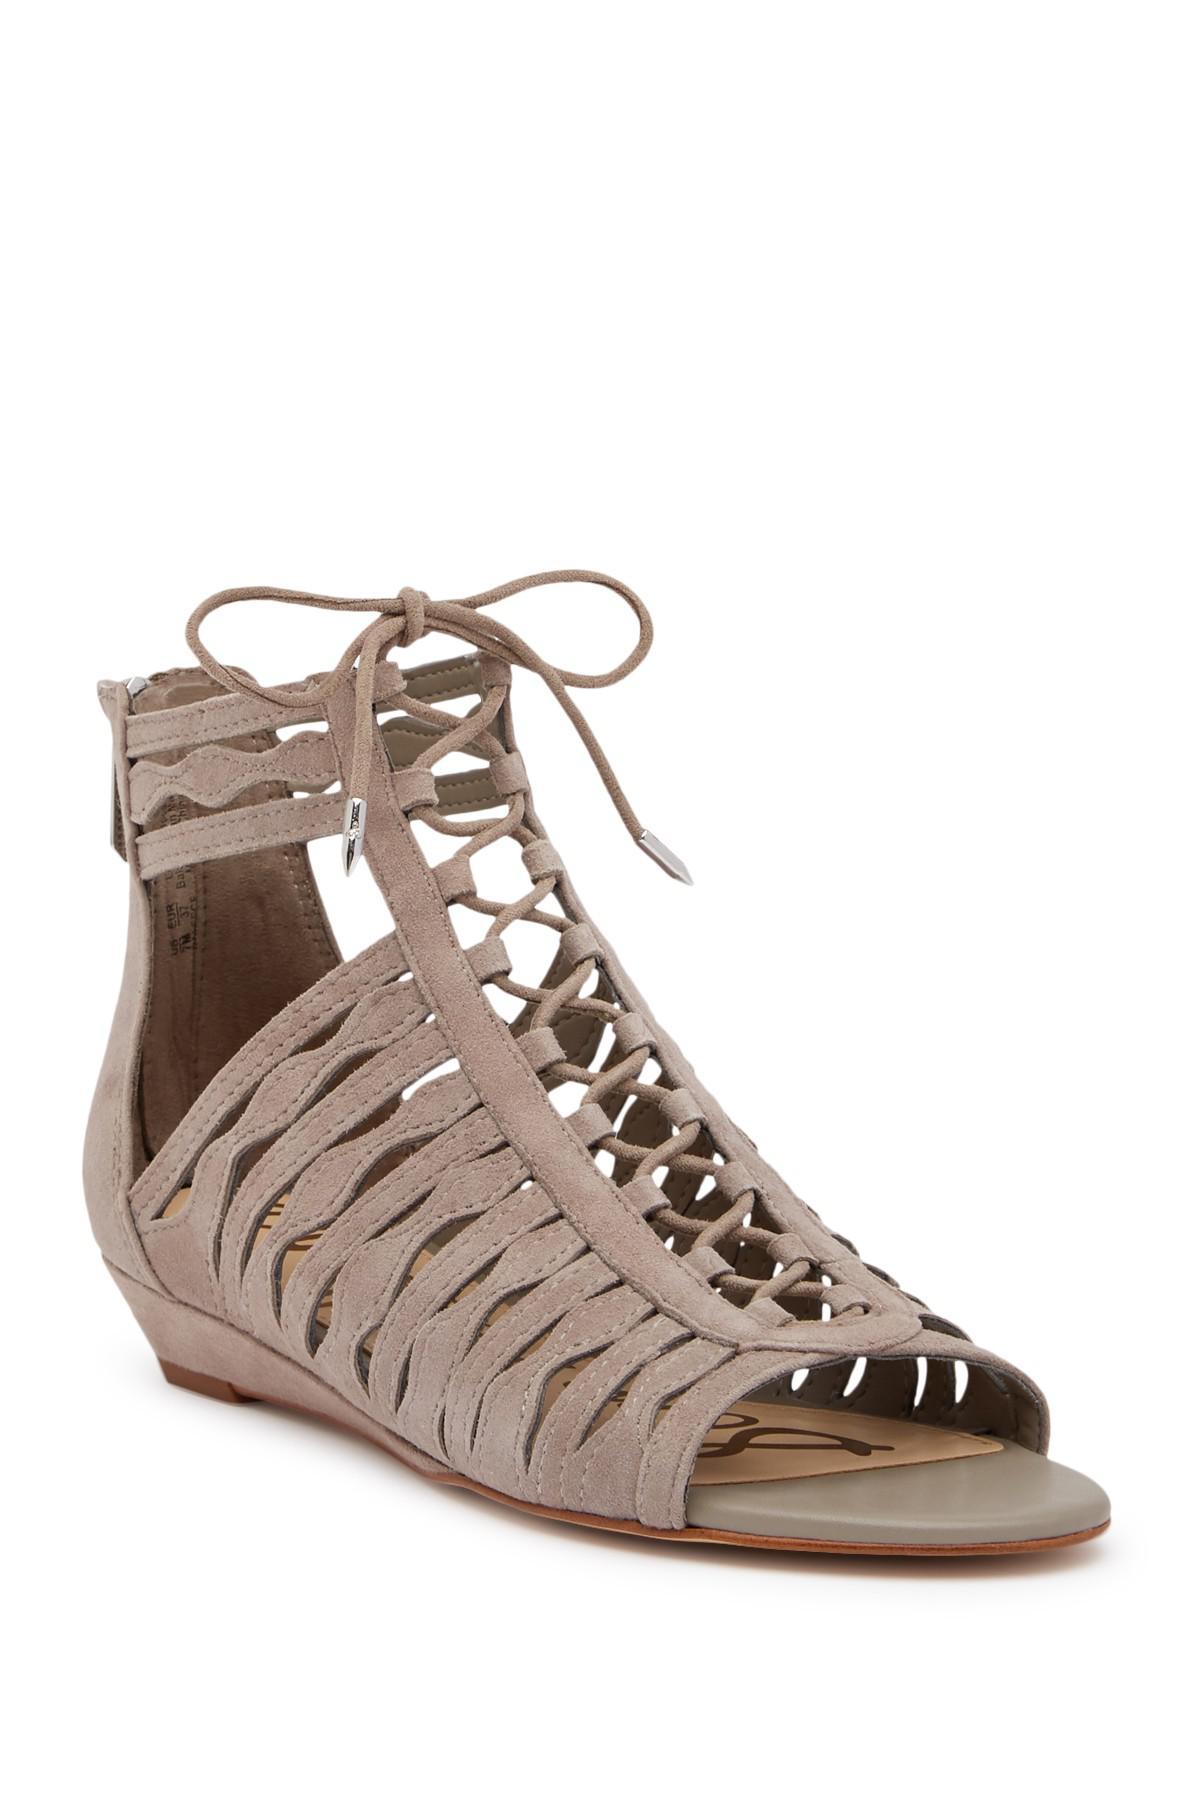 Sam Edelman Daleece Lace-Up Sandal HwFaa